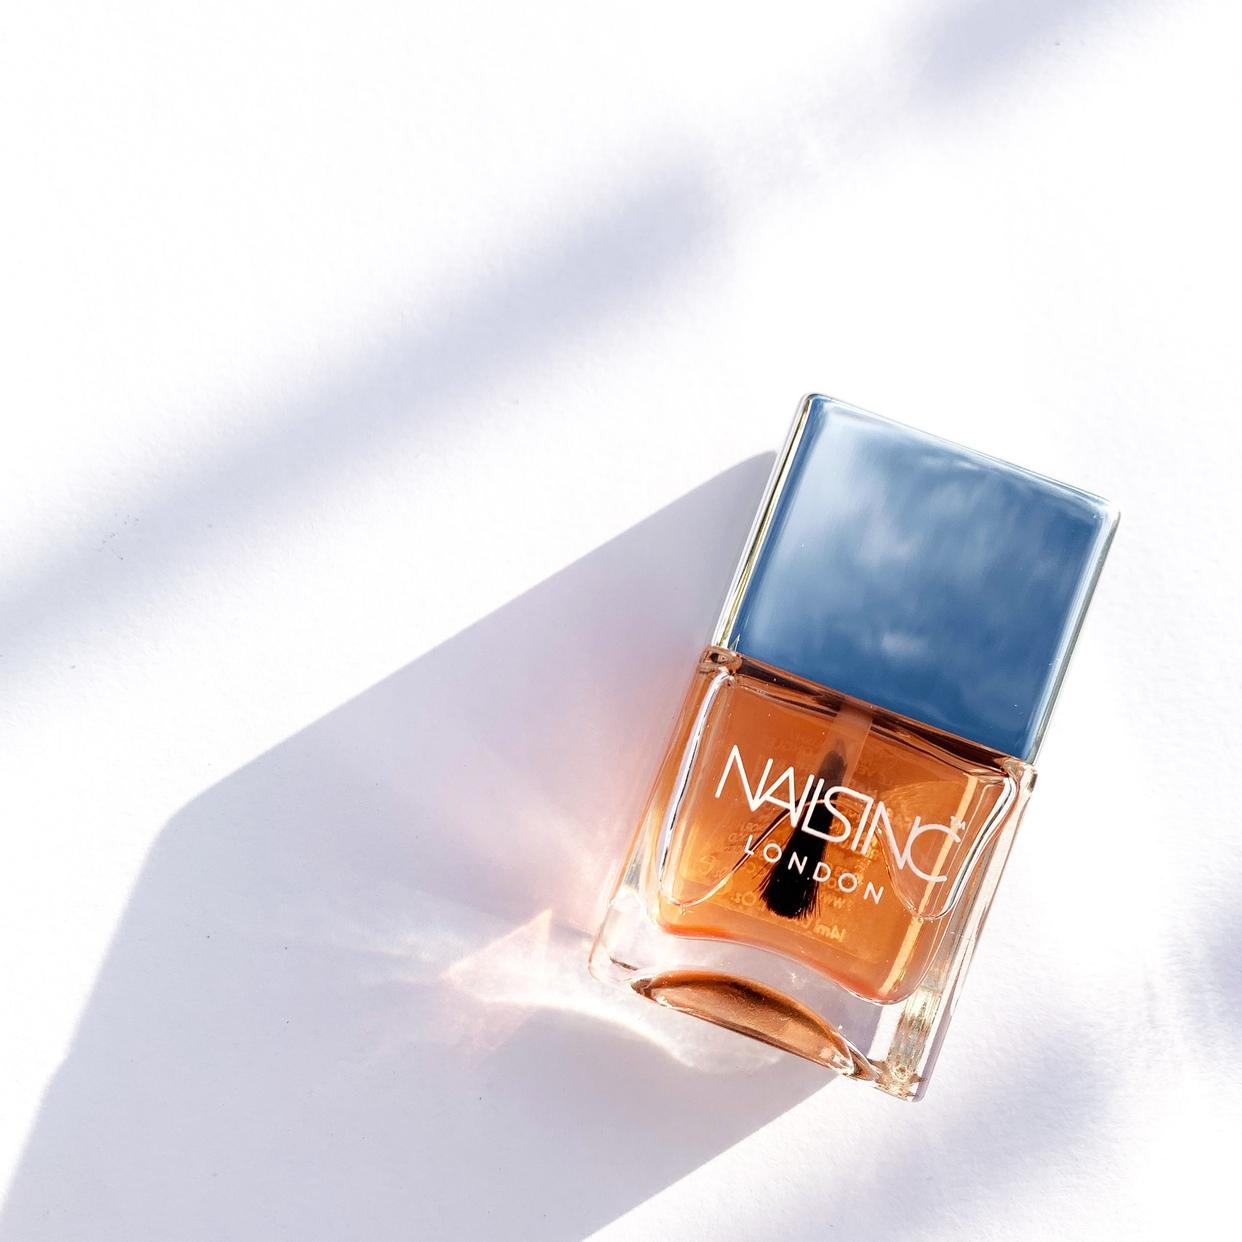 NAILS INC(ネイルズインク)45 セカンド トップコートを使ったかずさんのクチコミ画像1